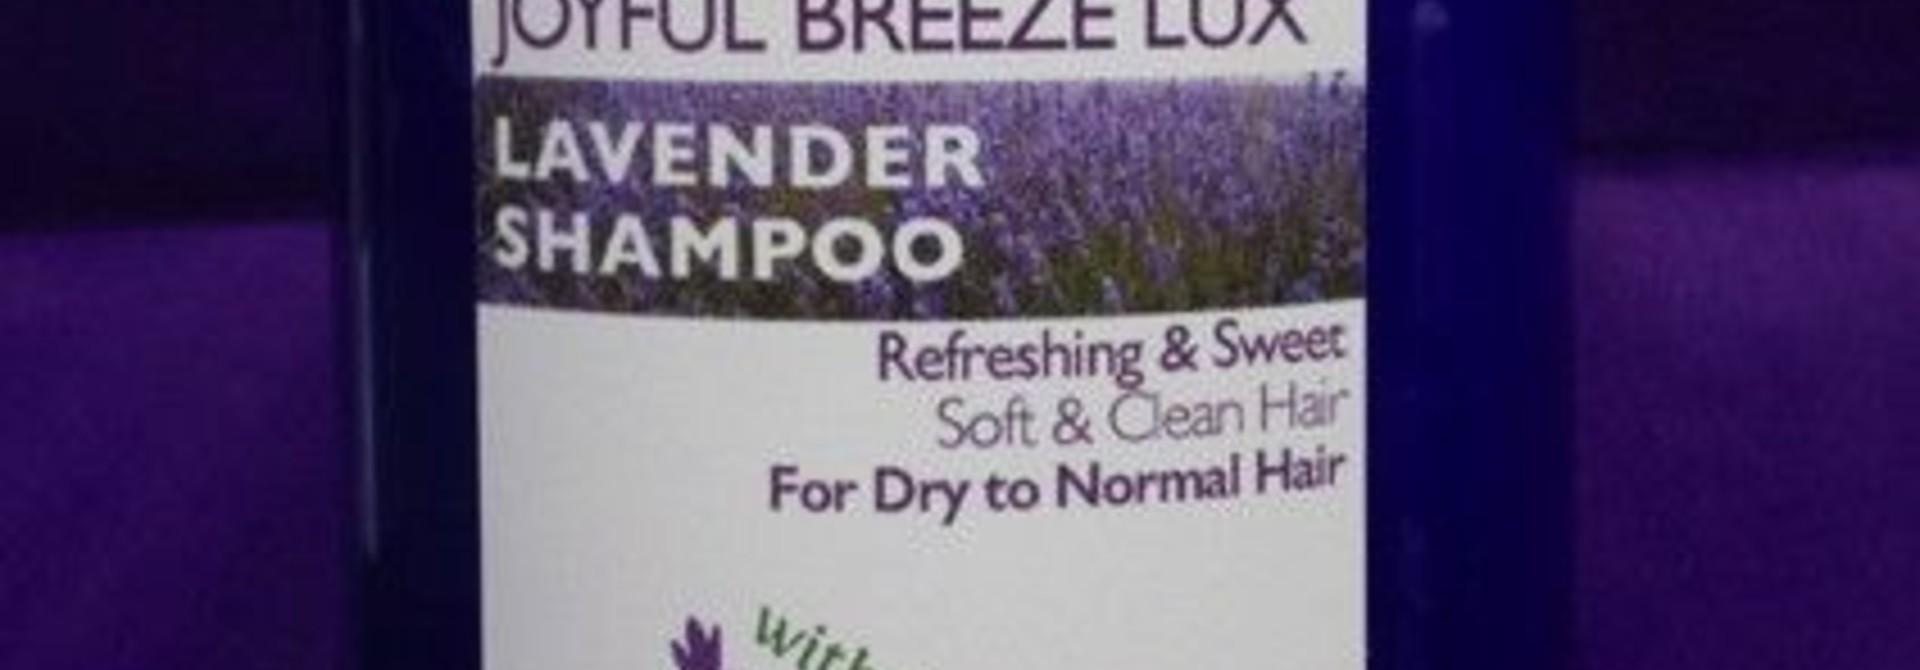 Joyful Breeze LUX Lavender Shampoo- 16 oz